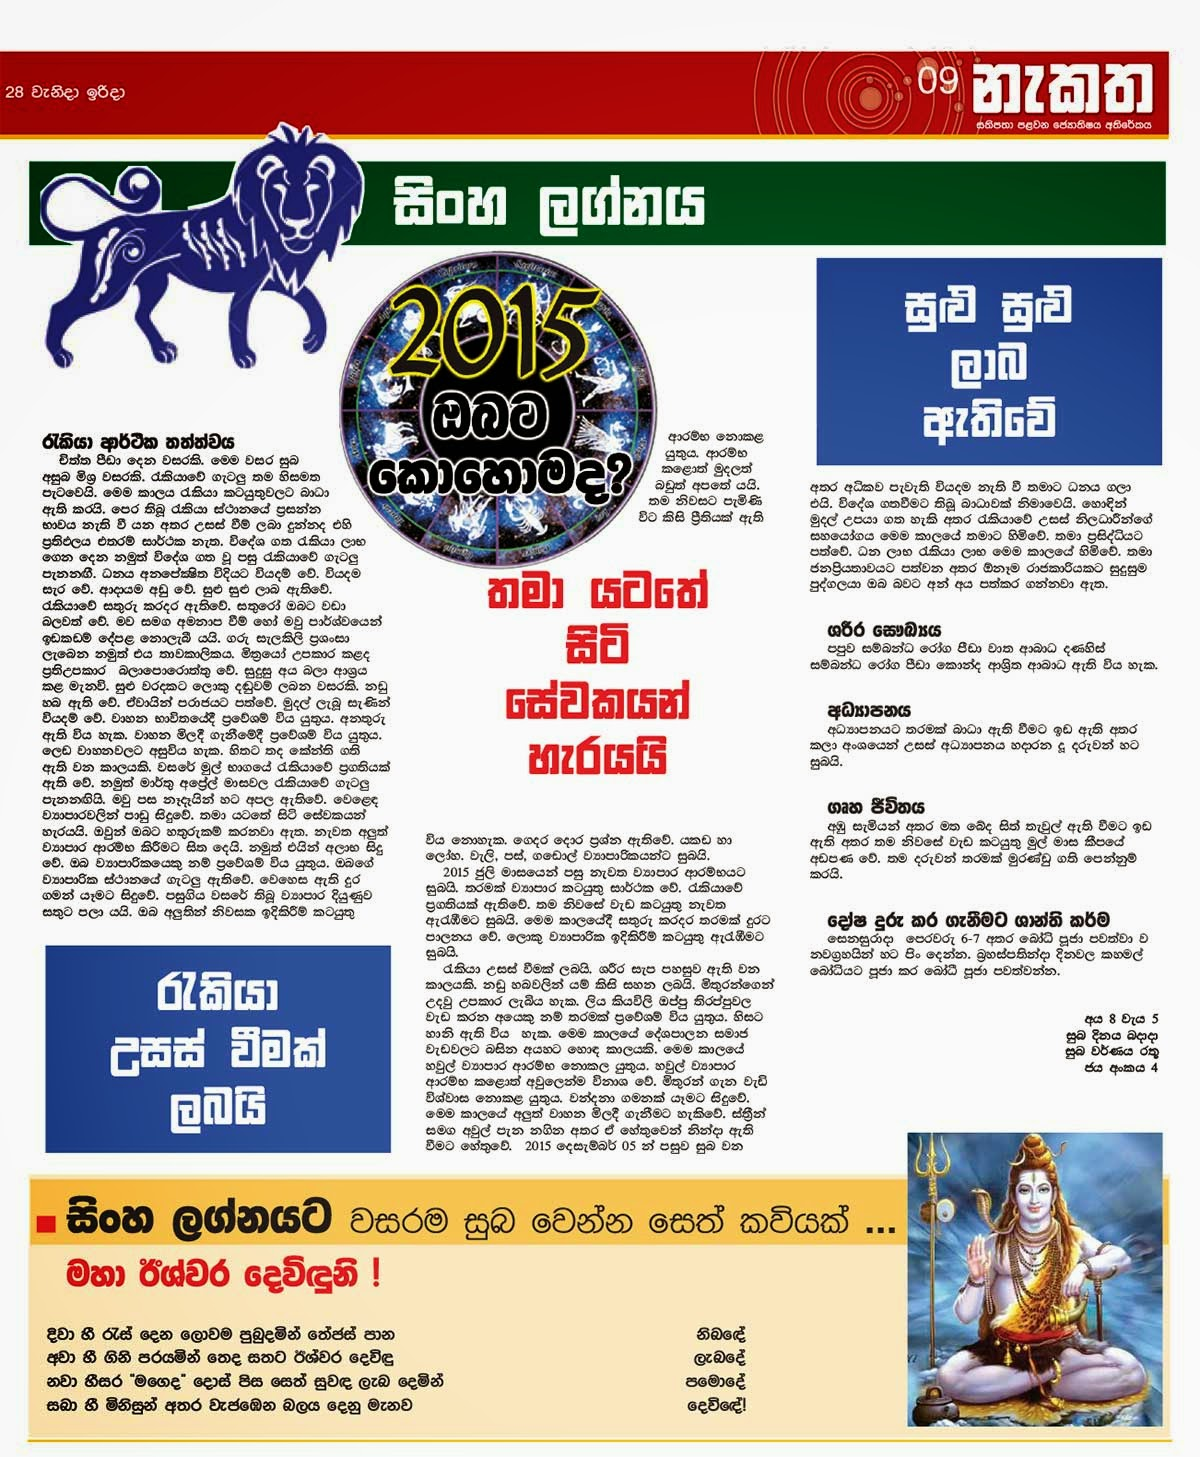 horoscope matching software free download sri lanka